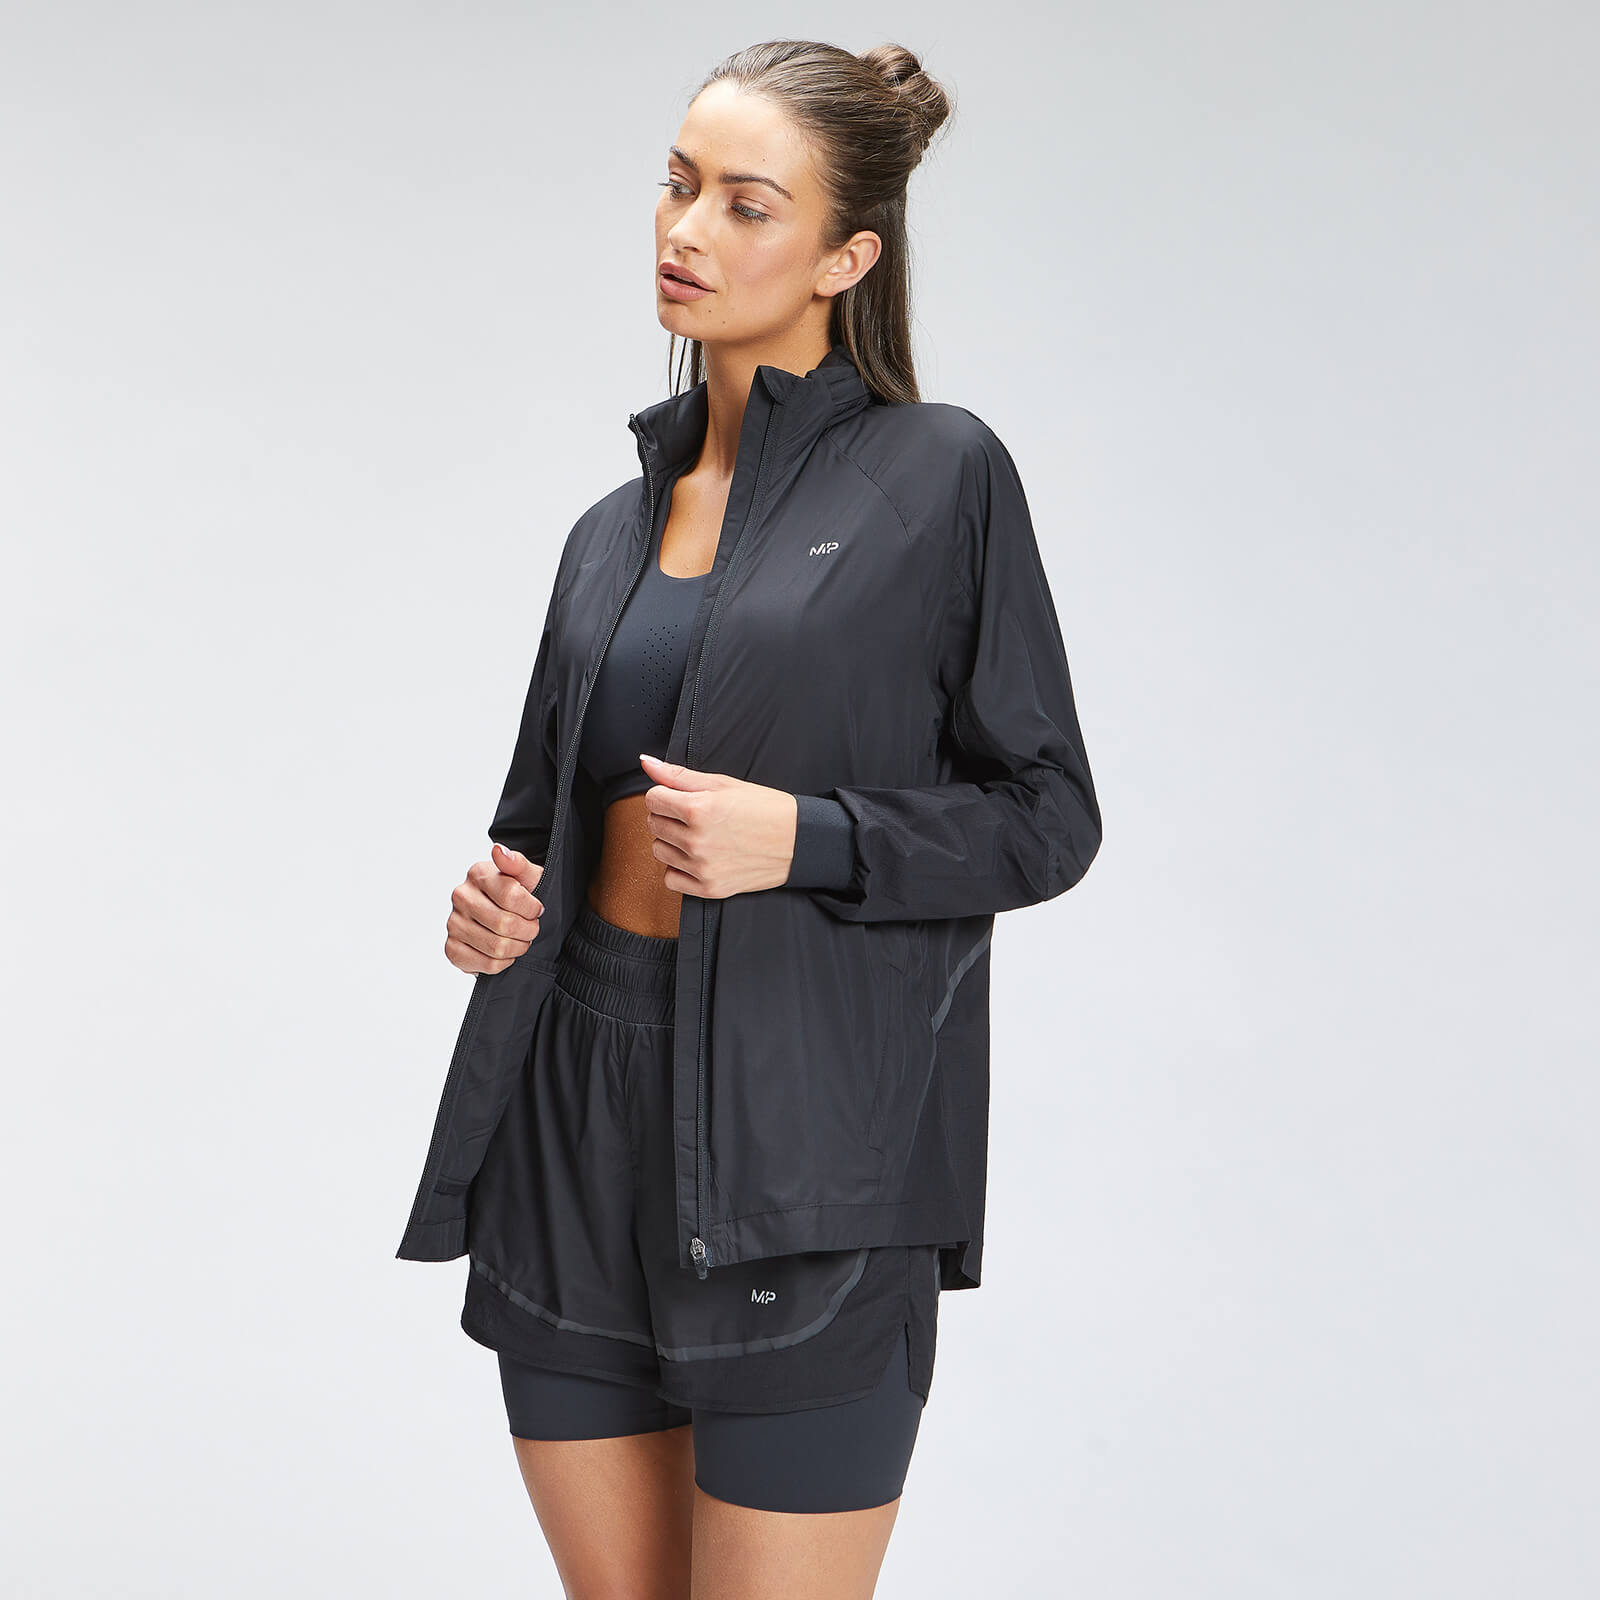 Купить MP Women's Velocity Running Jacket - Black - XXS, Myprotein International